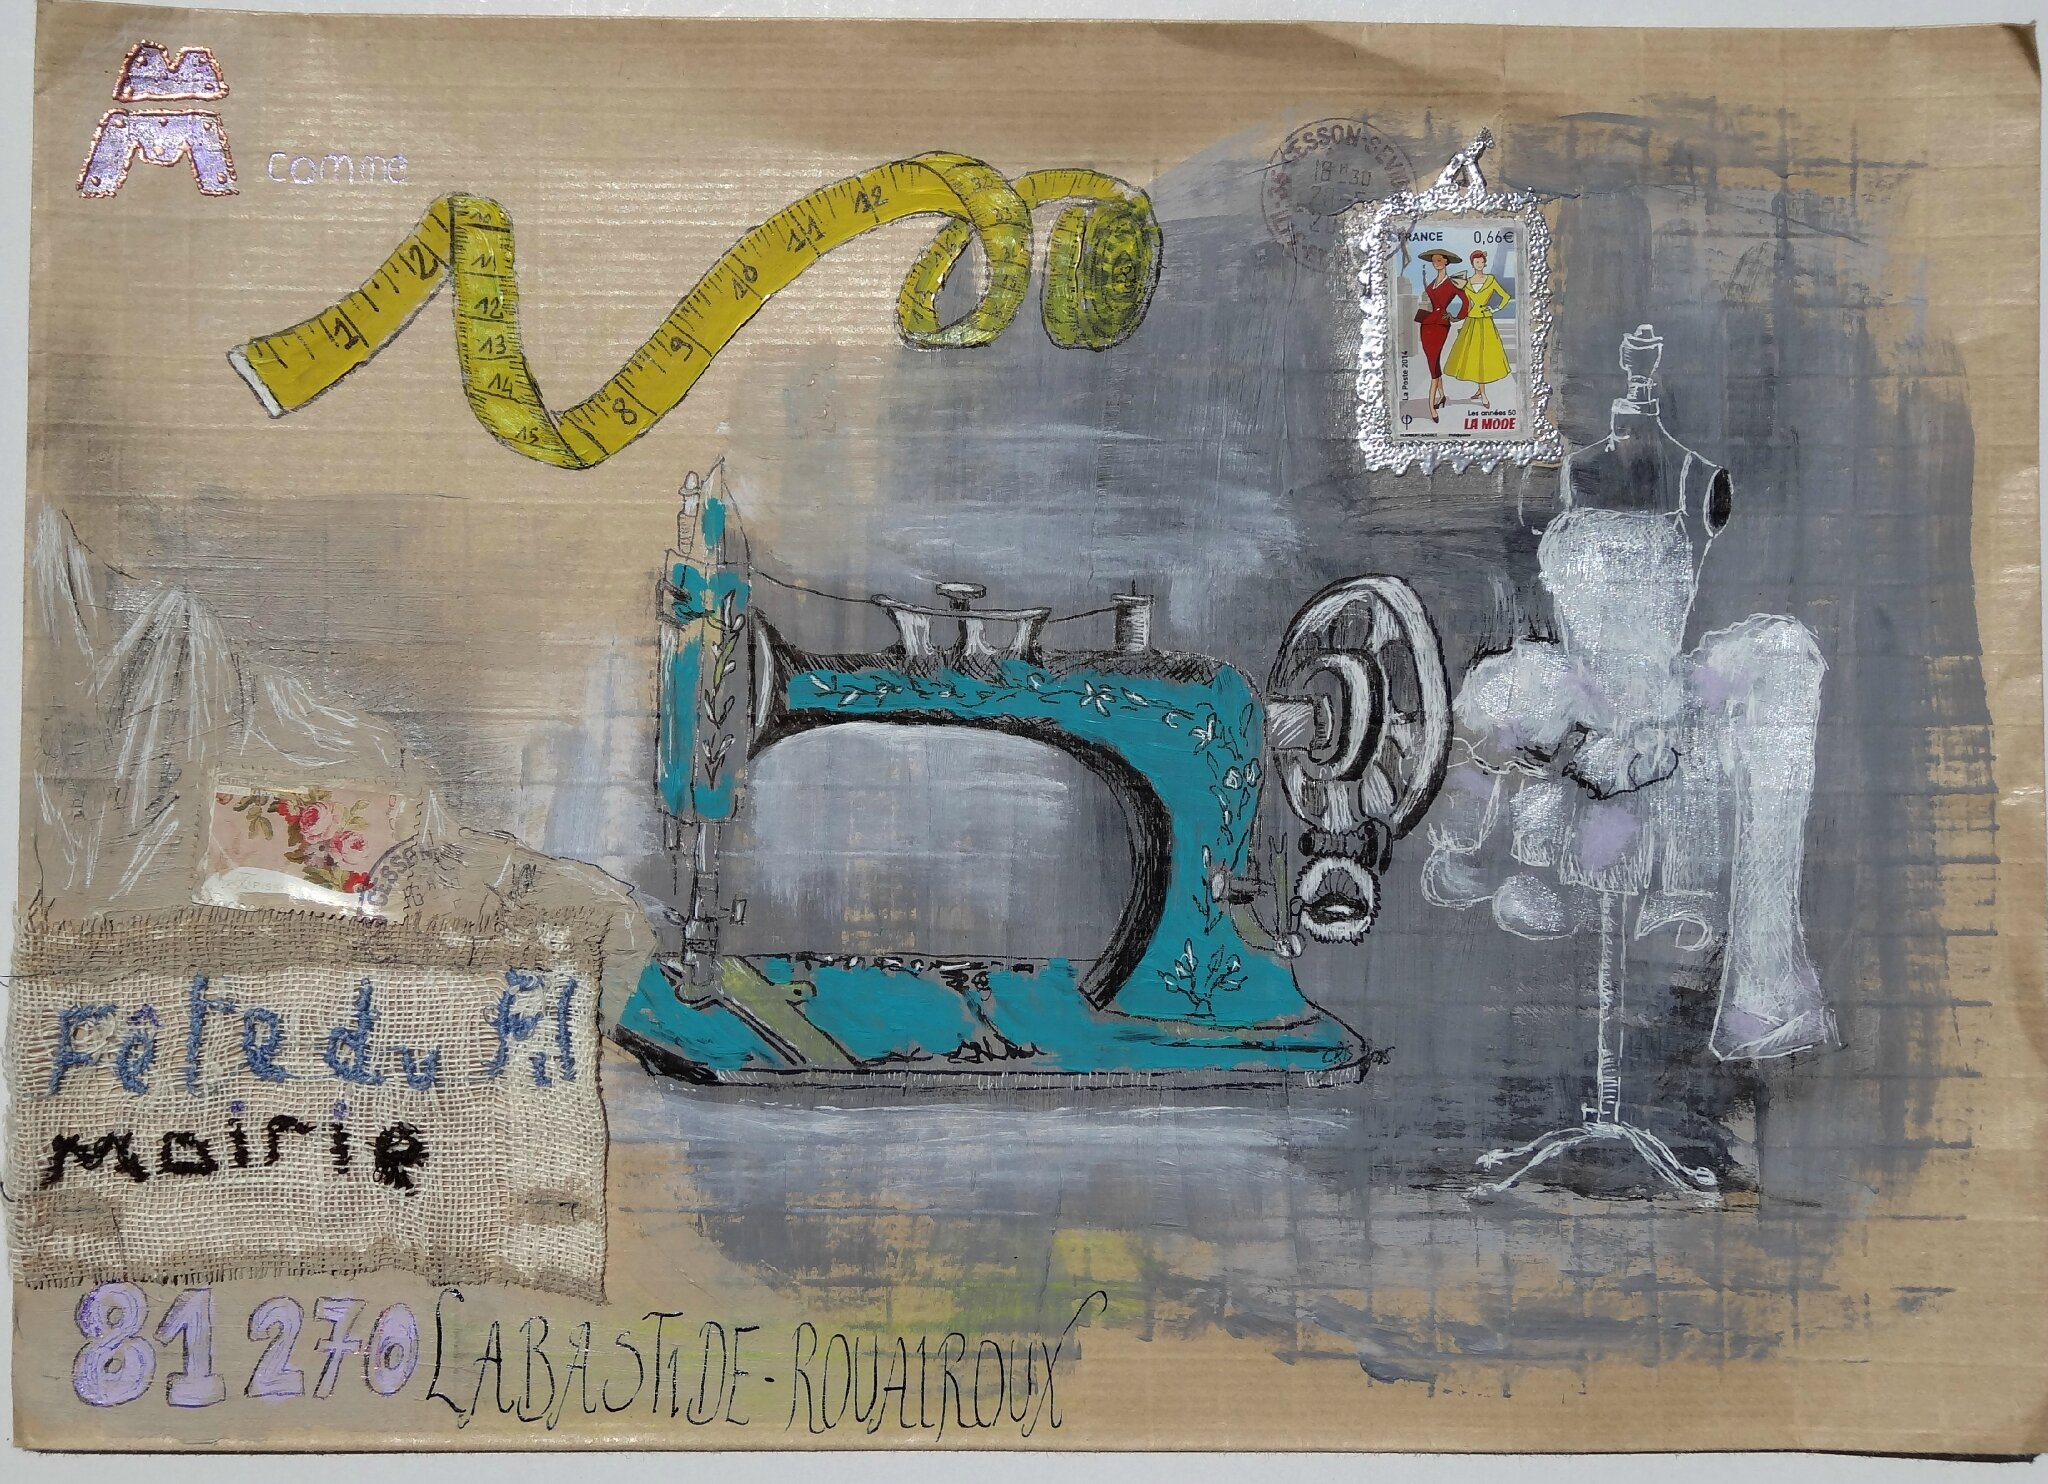 Bongibault christine m art postal fête du fil 2015